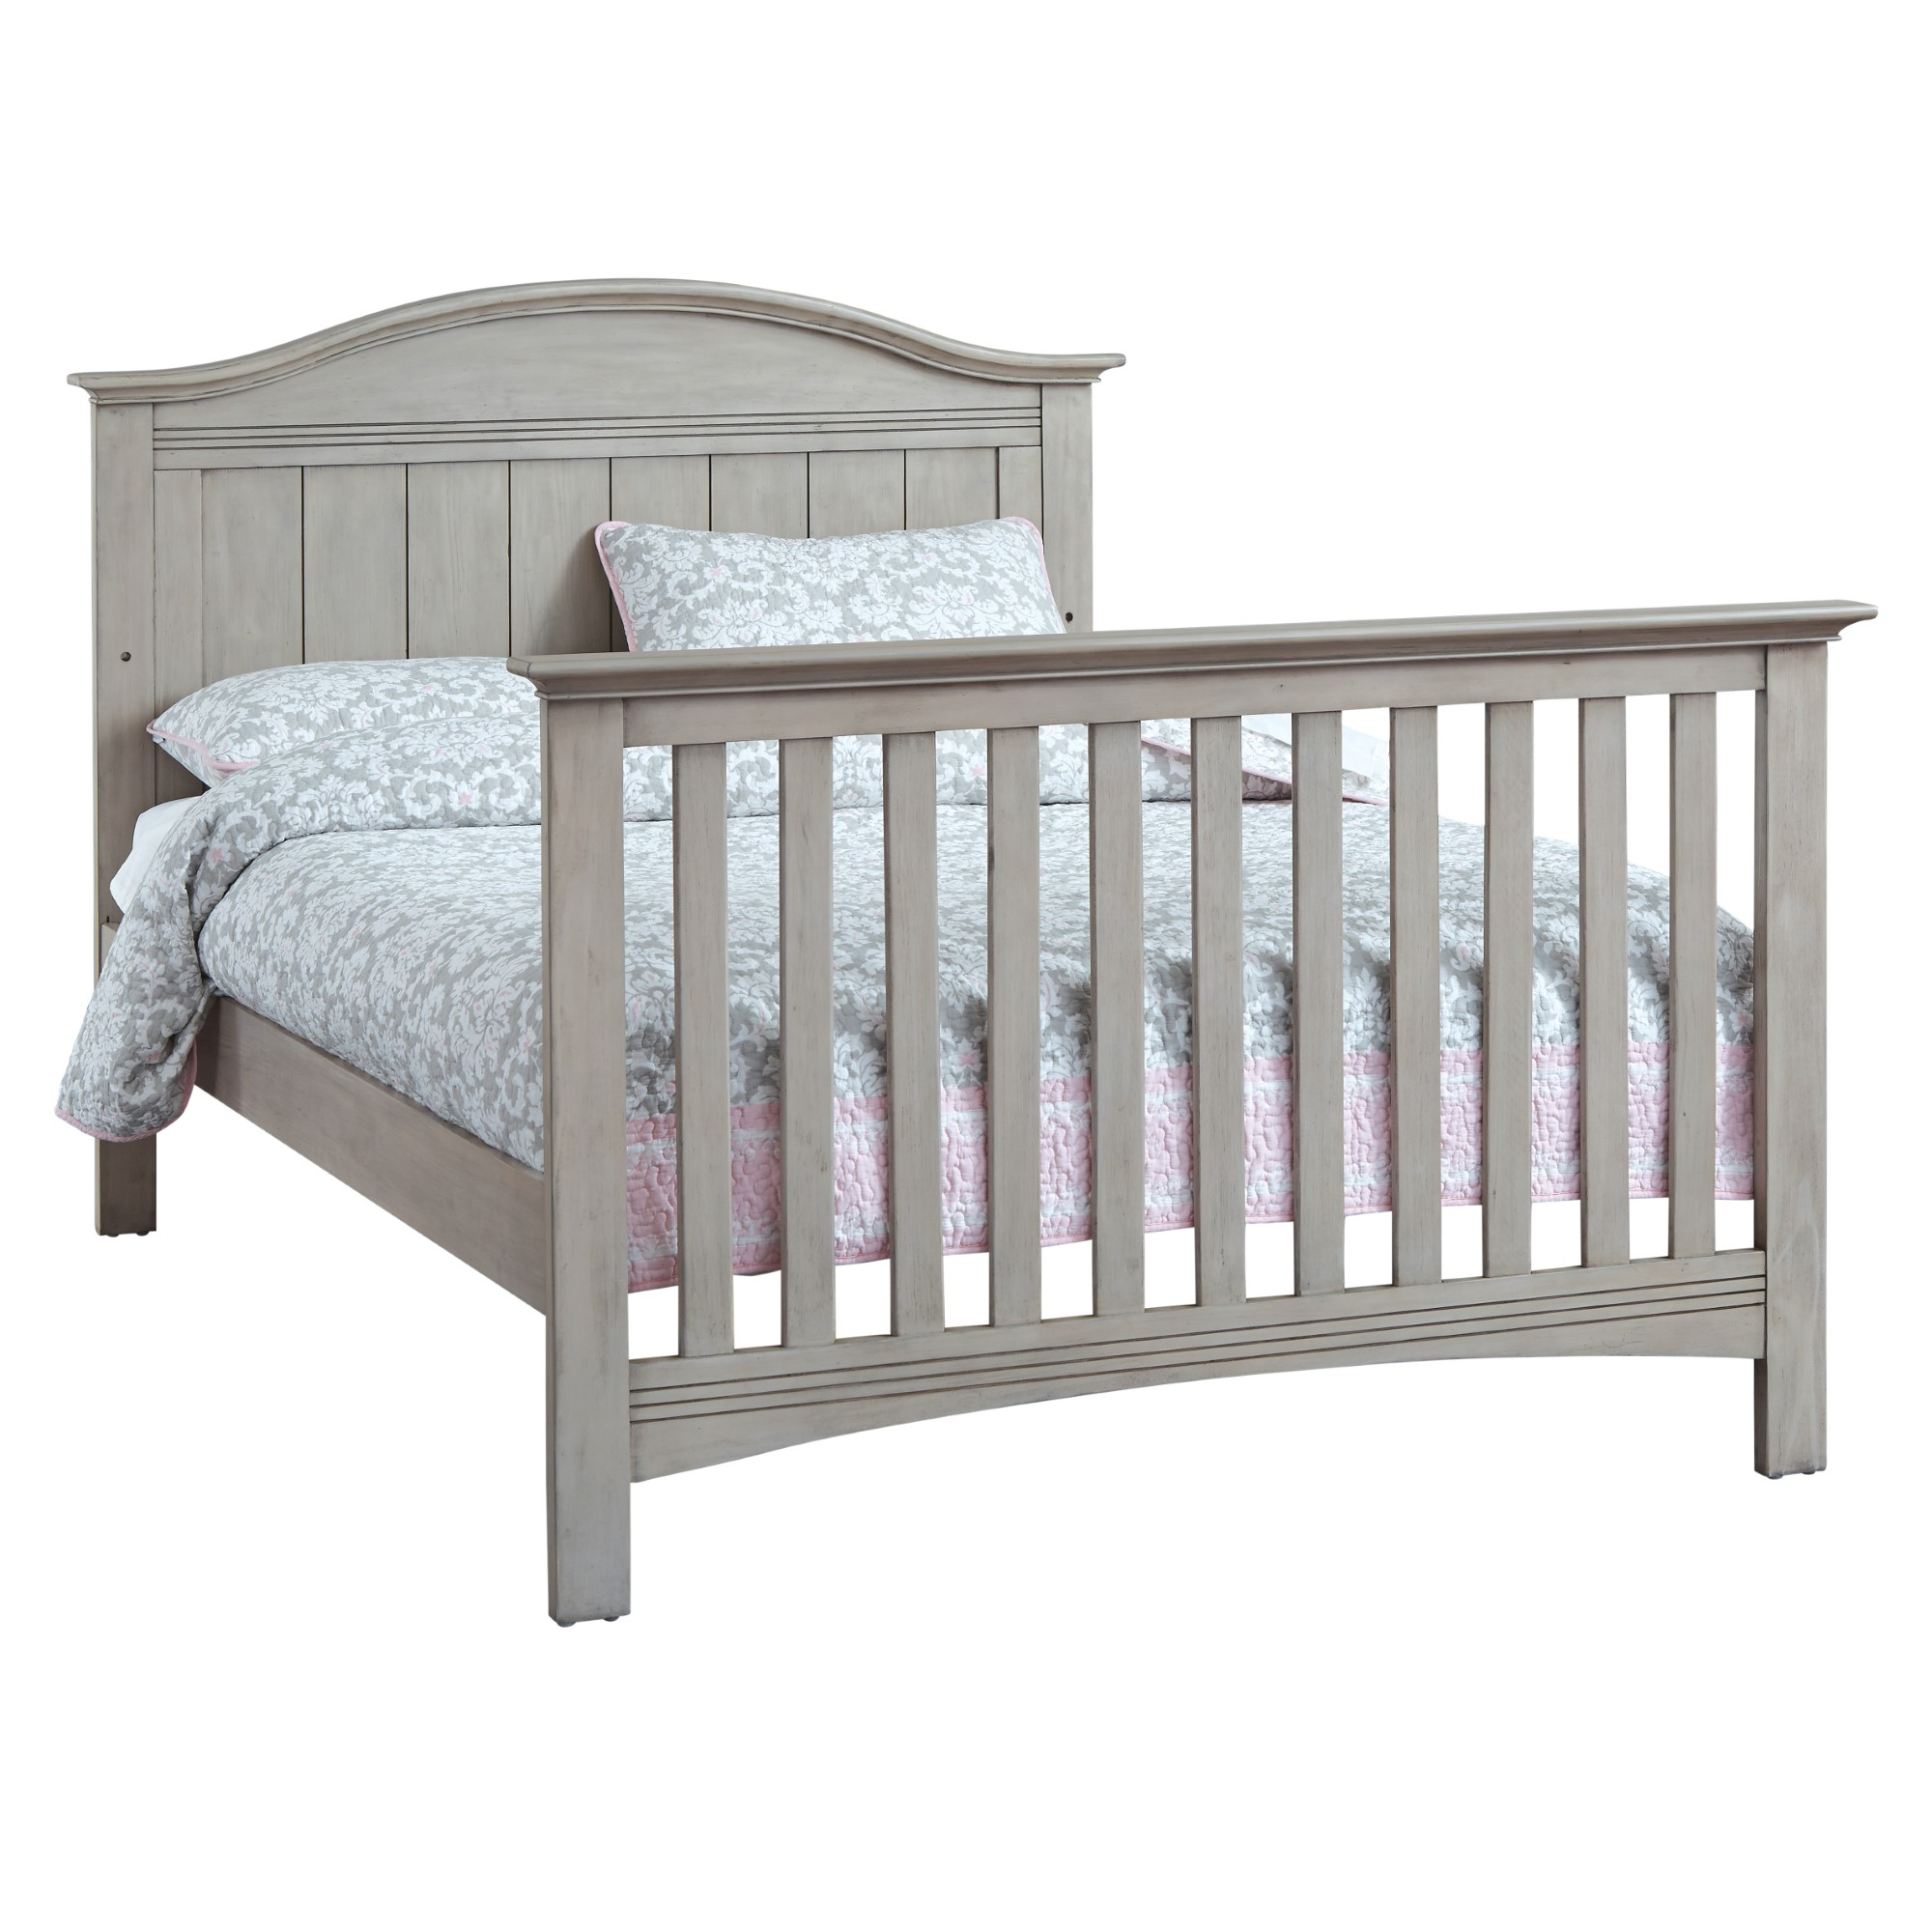 4 Toddler Changing 1 Crib Bed Convertible